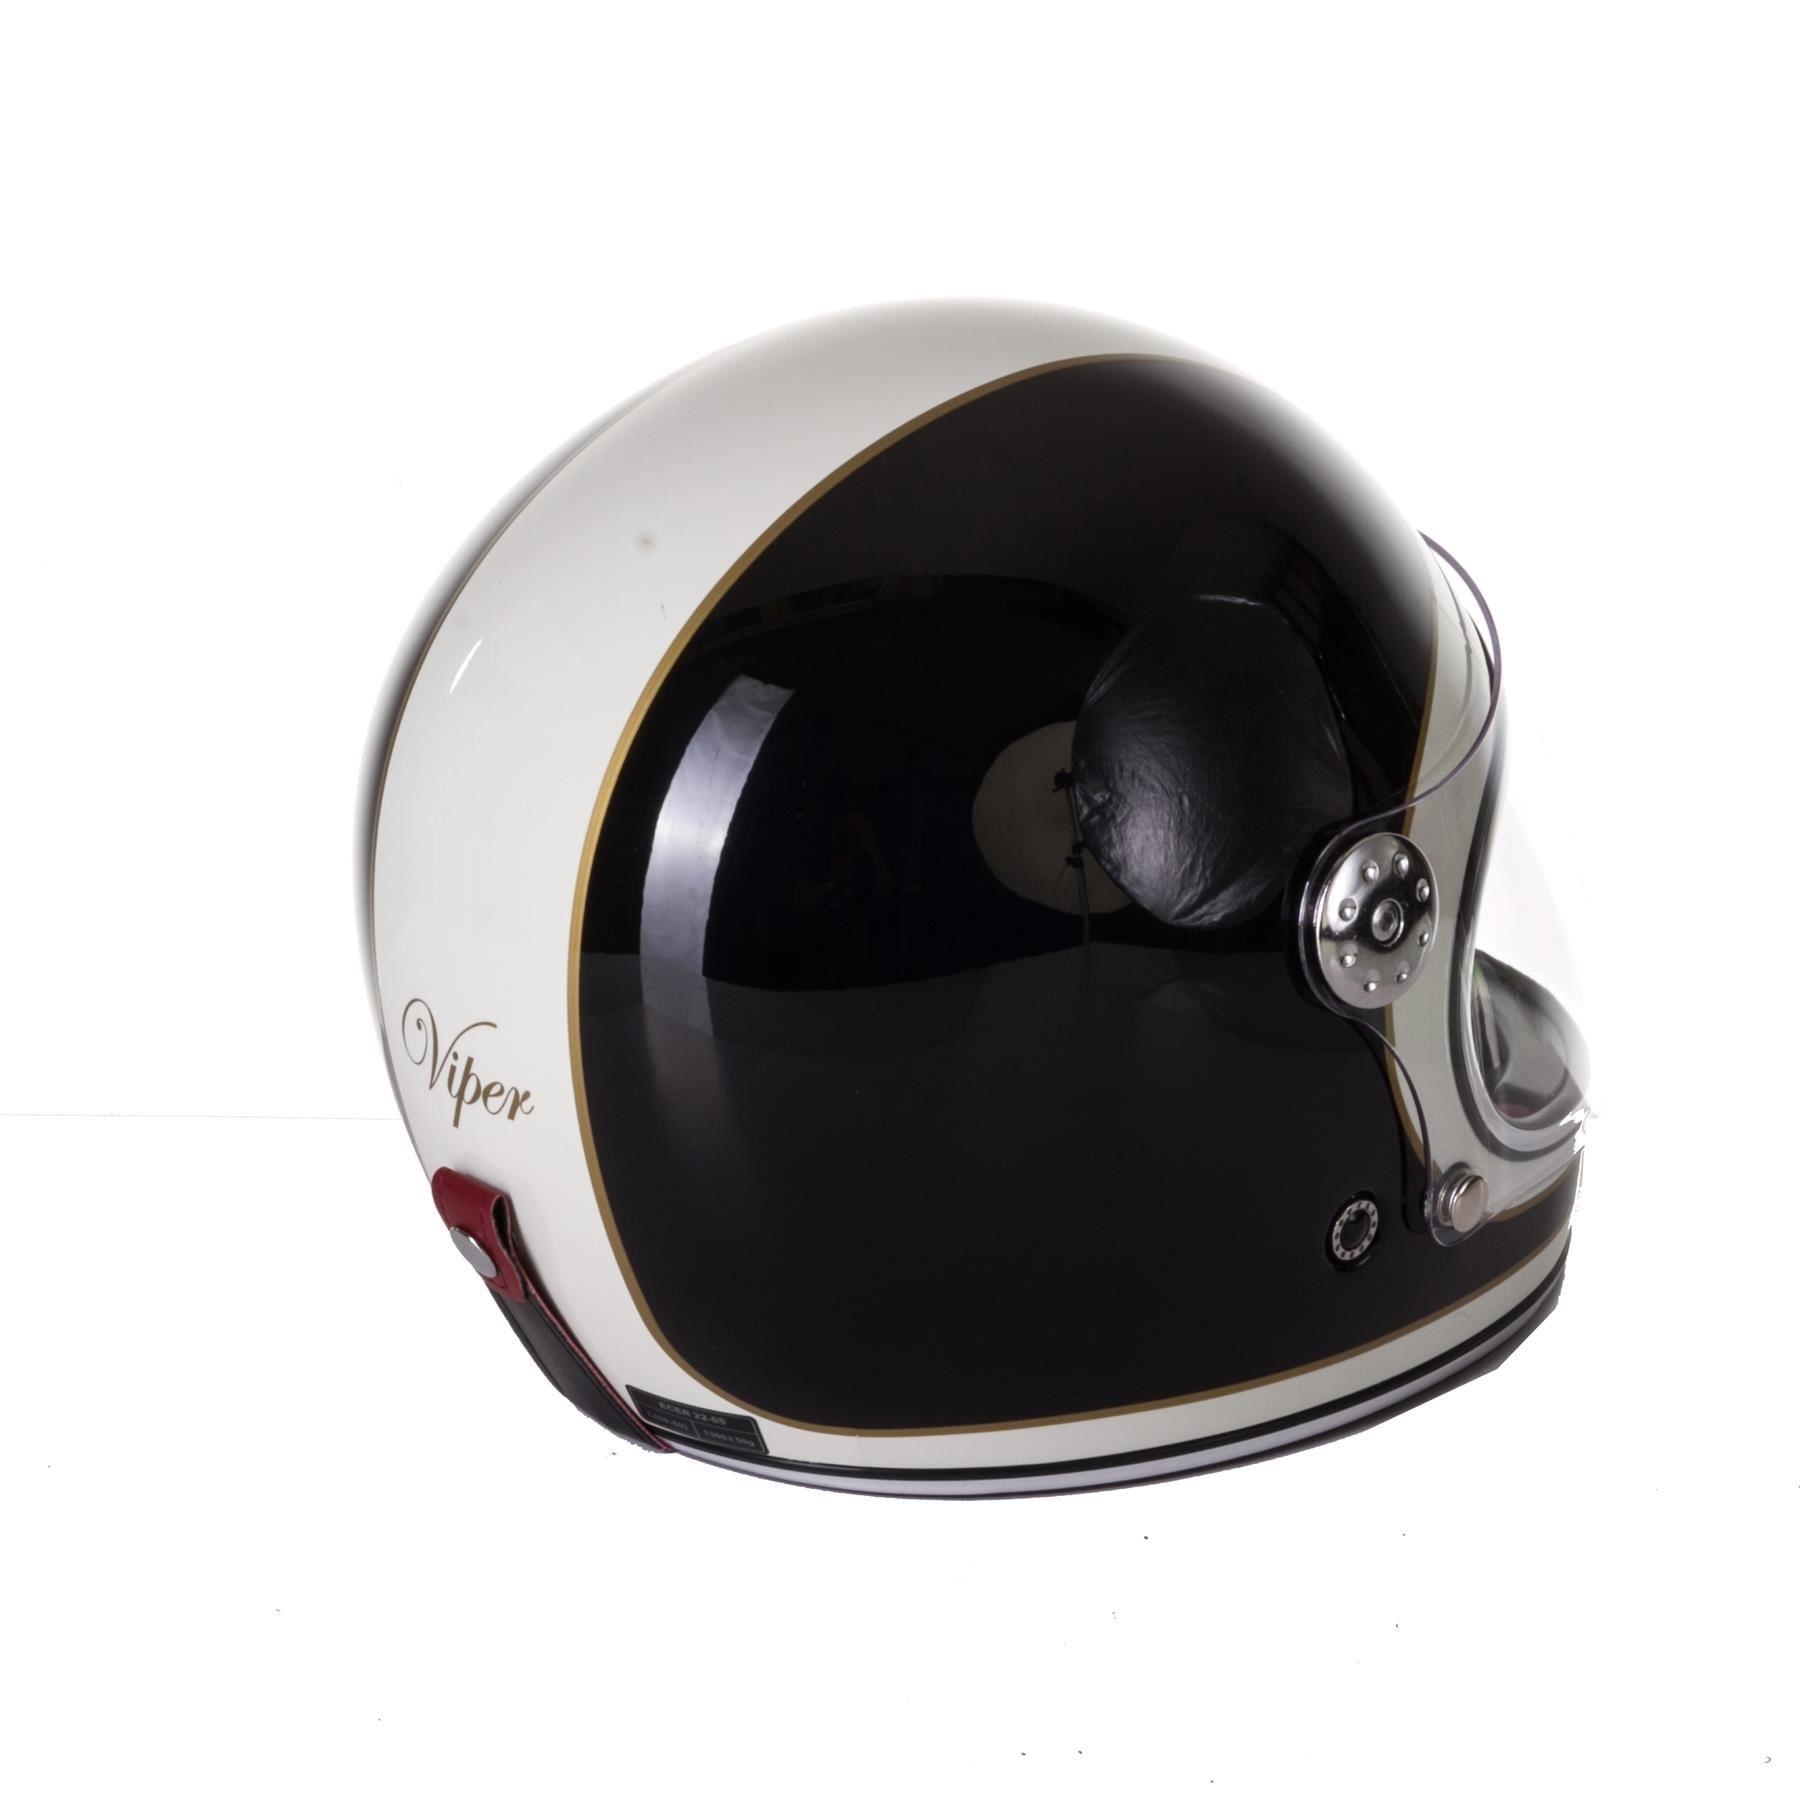 Viper-F656-Retro-Vintage-FibreGlass-Full-Face-Motorcycle-Bike-Road-Crash-Helmet miniature 6